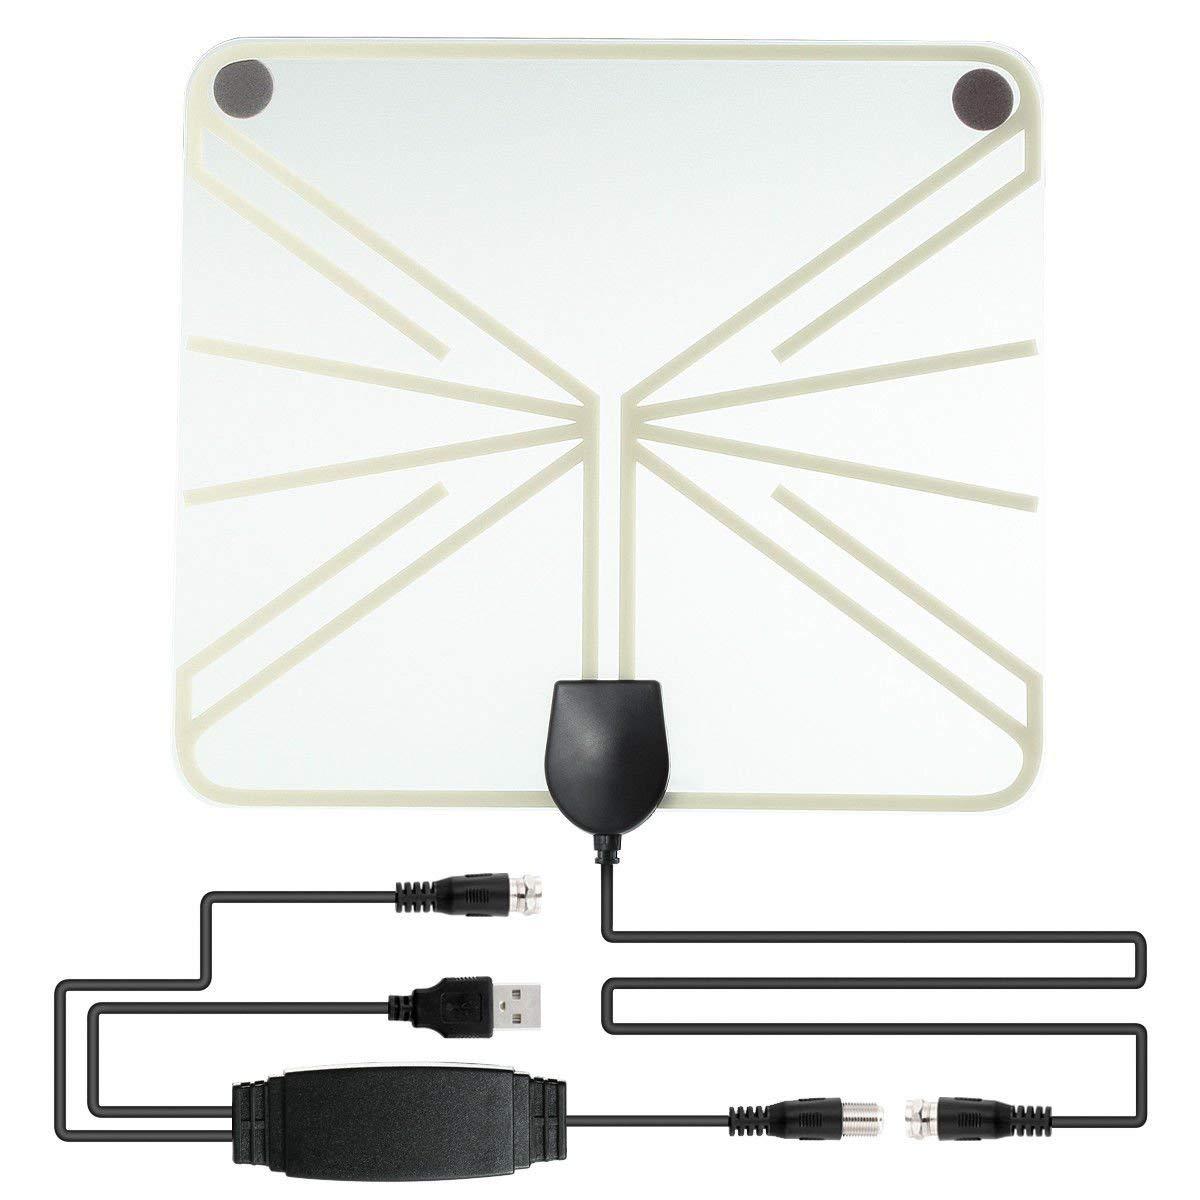 FidgetFidget Digital Indoor USB TV Antenna Signal Receiver Amplifier 50 Mile Range